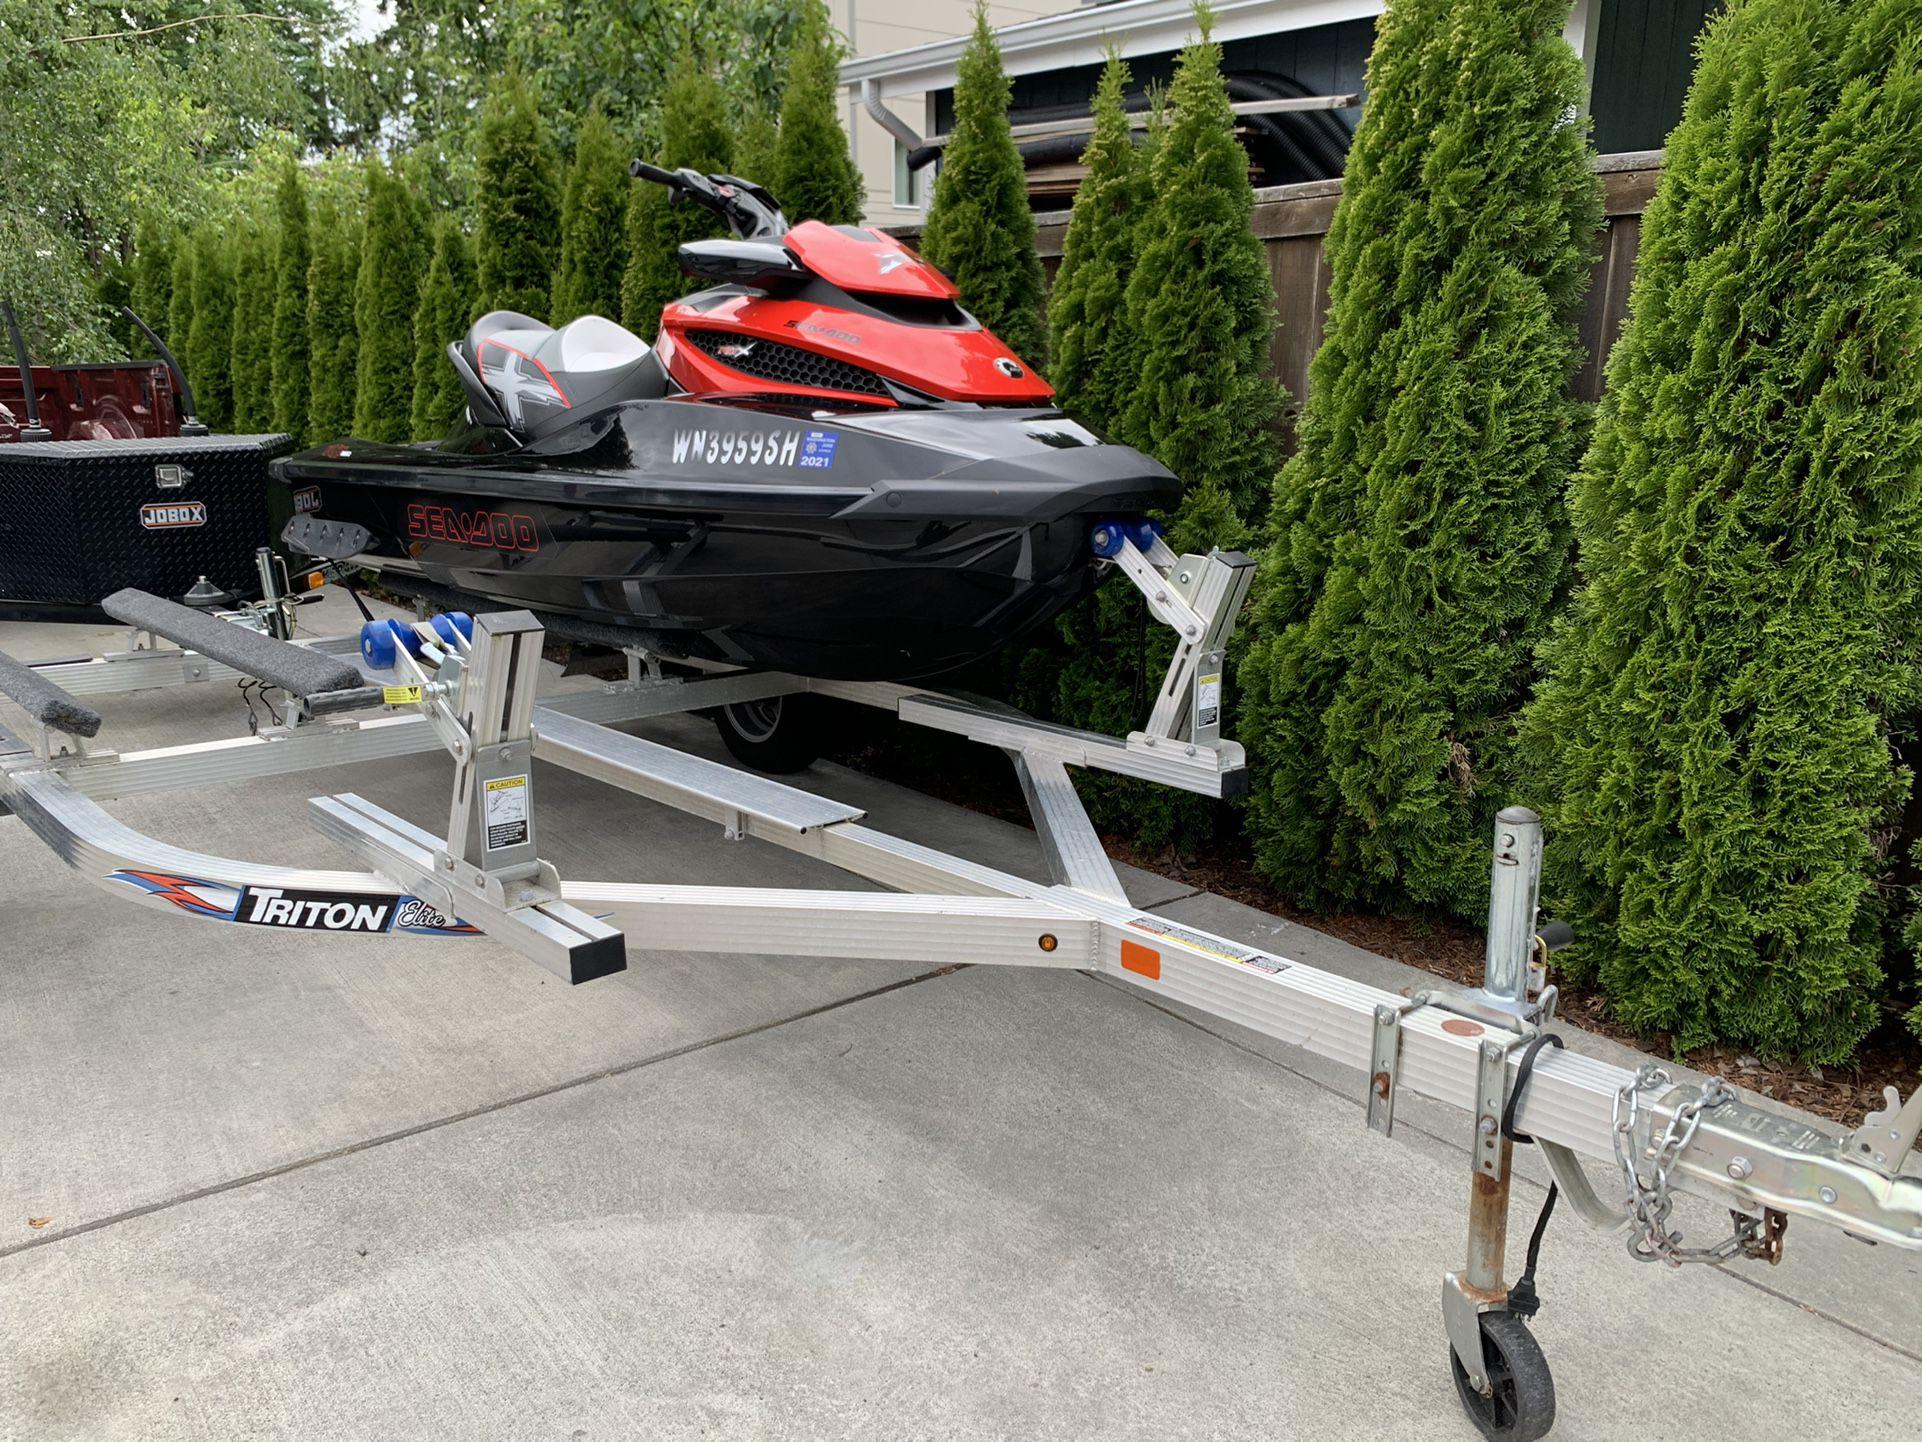 Photo Seadoo Sea Doo Rxt260 Jetski Jet Ski Yamaha Boat Trailer